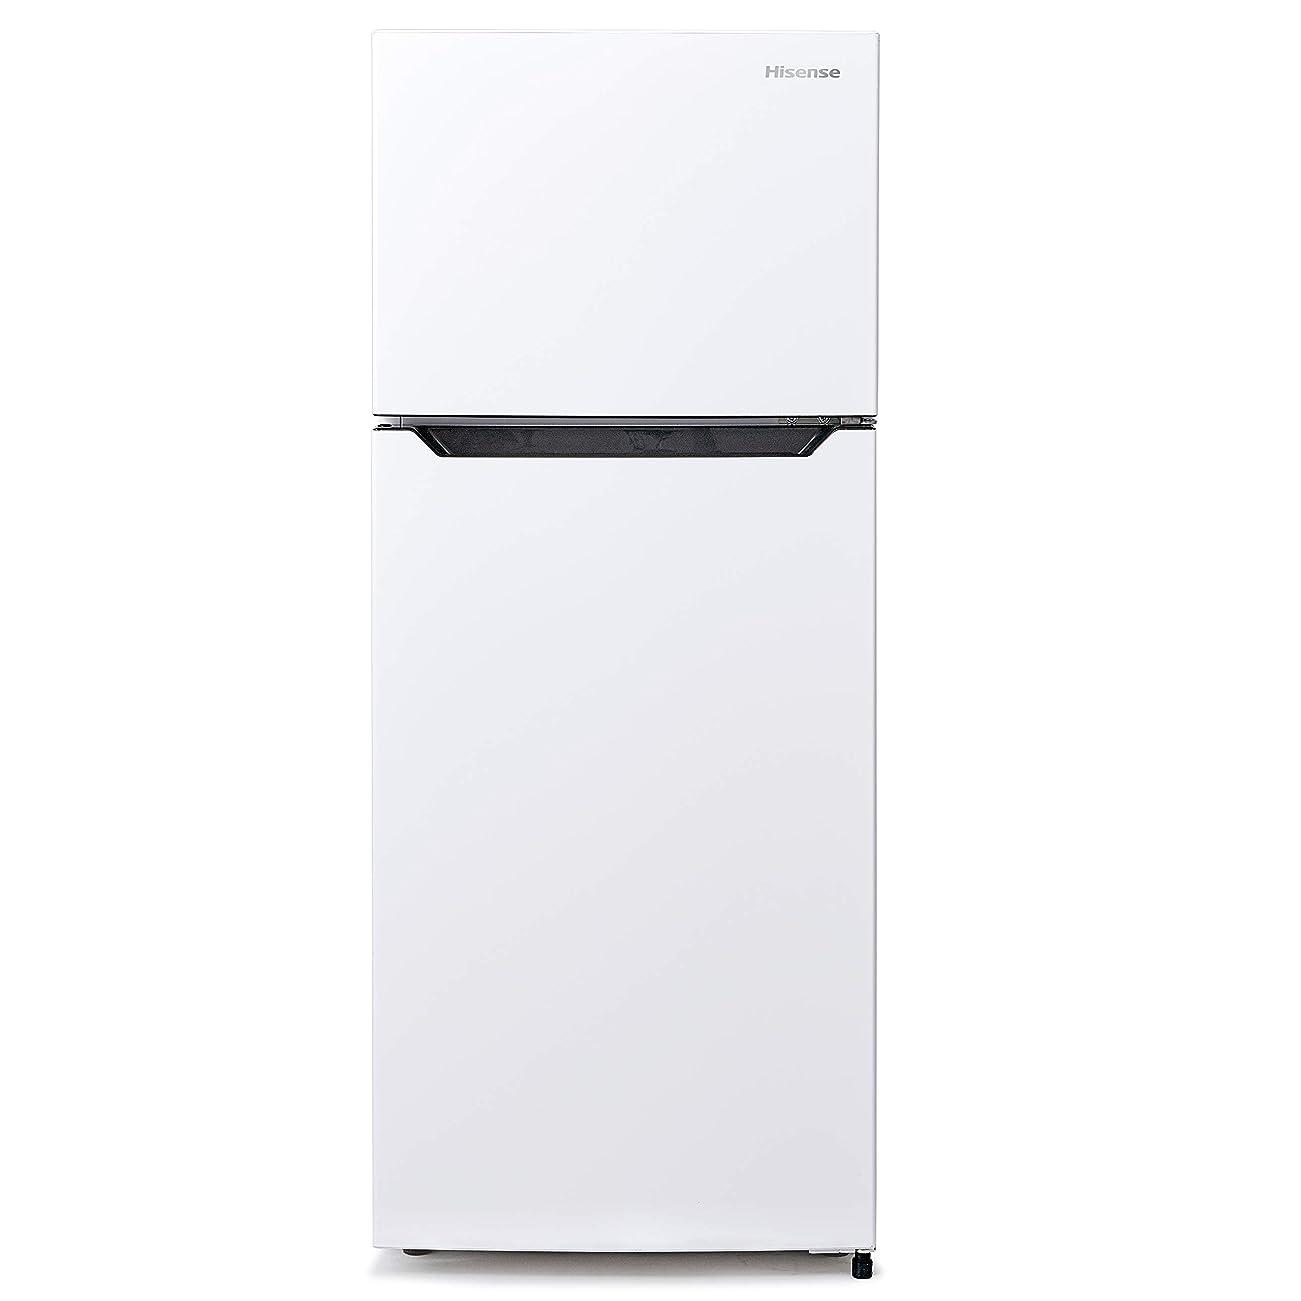 Hisense(ハイセンス) 冷凍冷蔵庫 HR-B12C